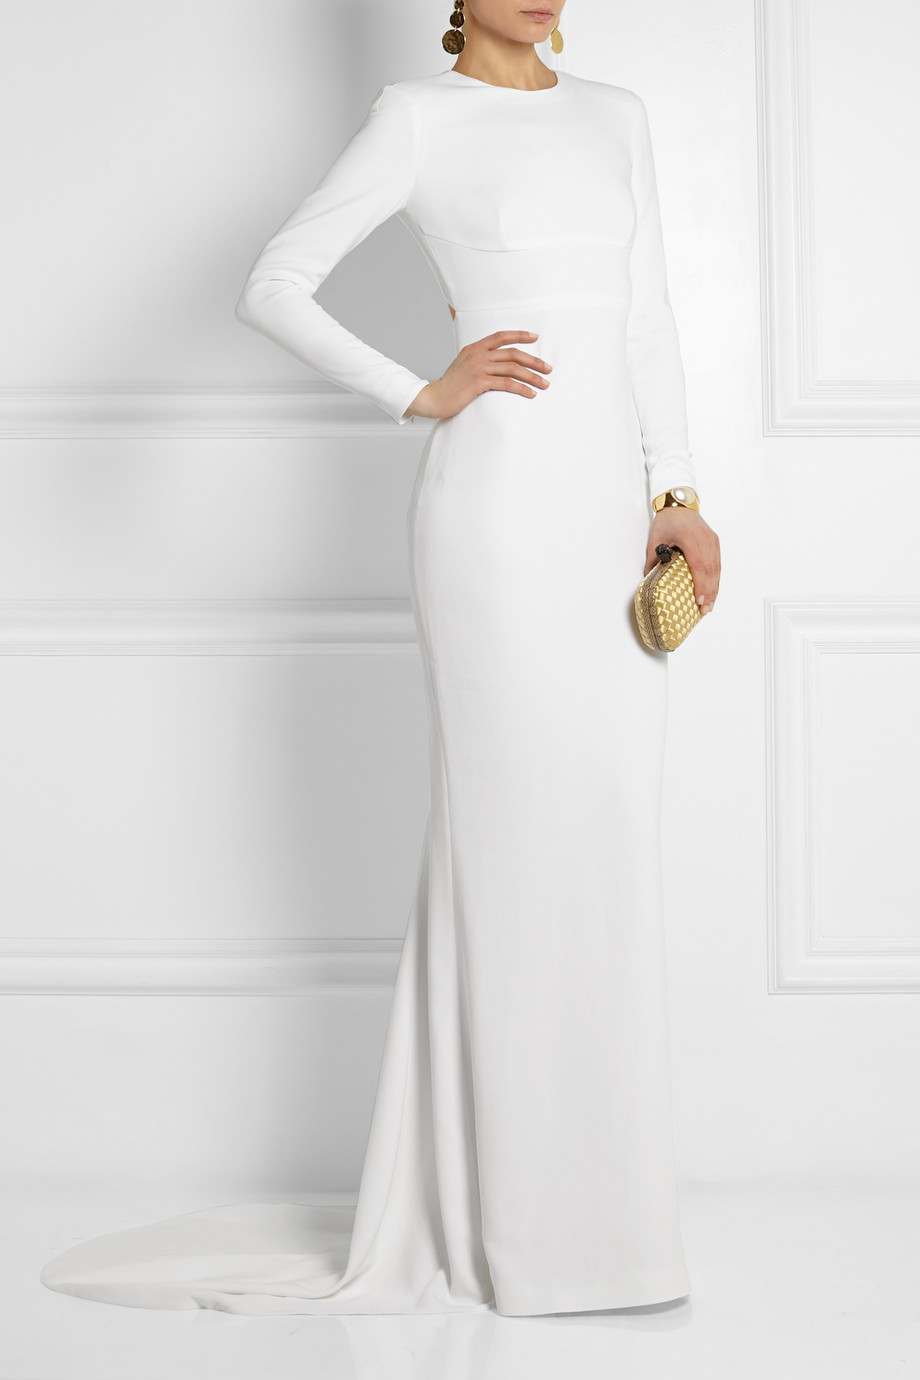 Stella mccartney Renee OpenBack Crepe Gown in White  Lyst